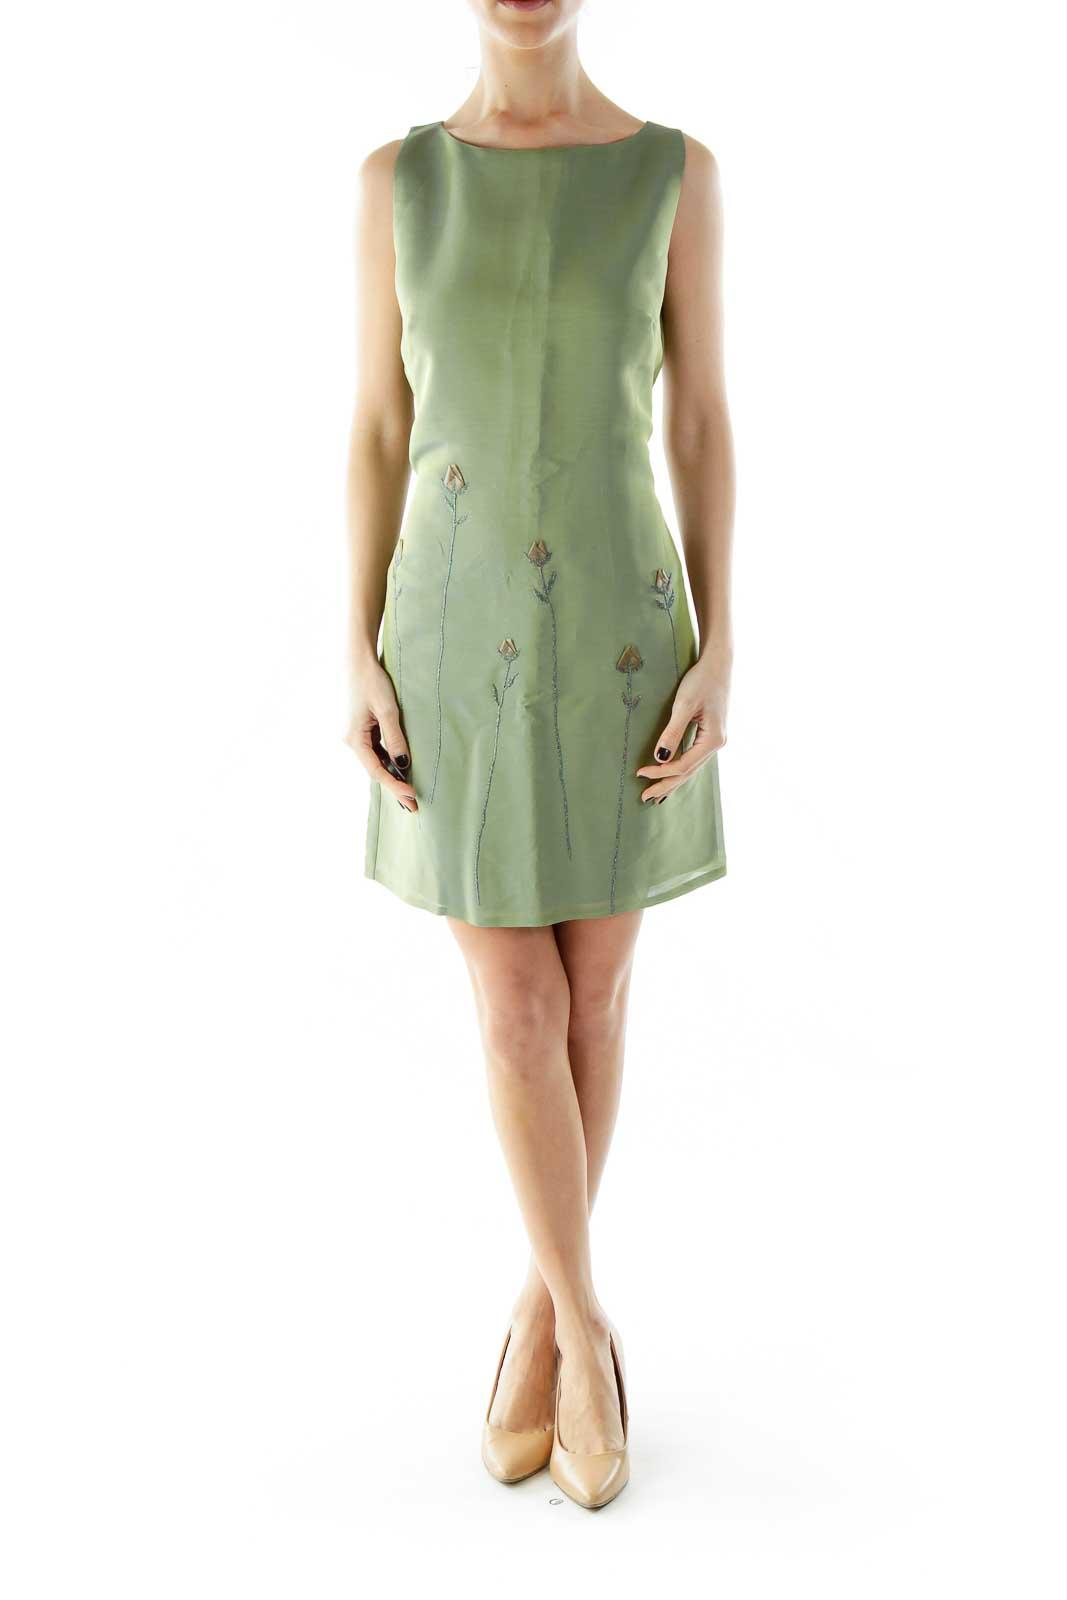 Green Embroidered Flower Sheath Dress